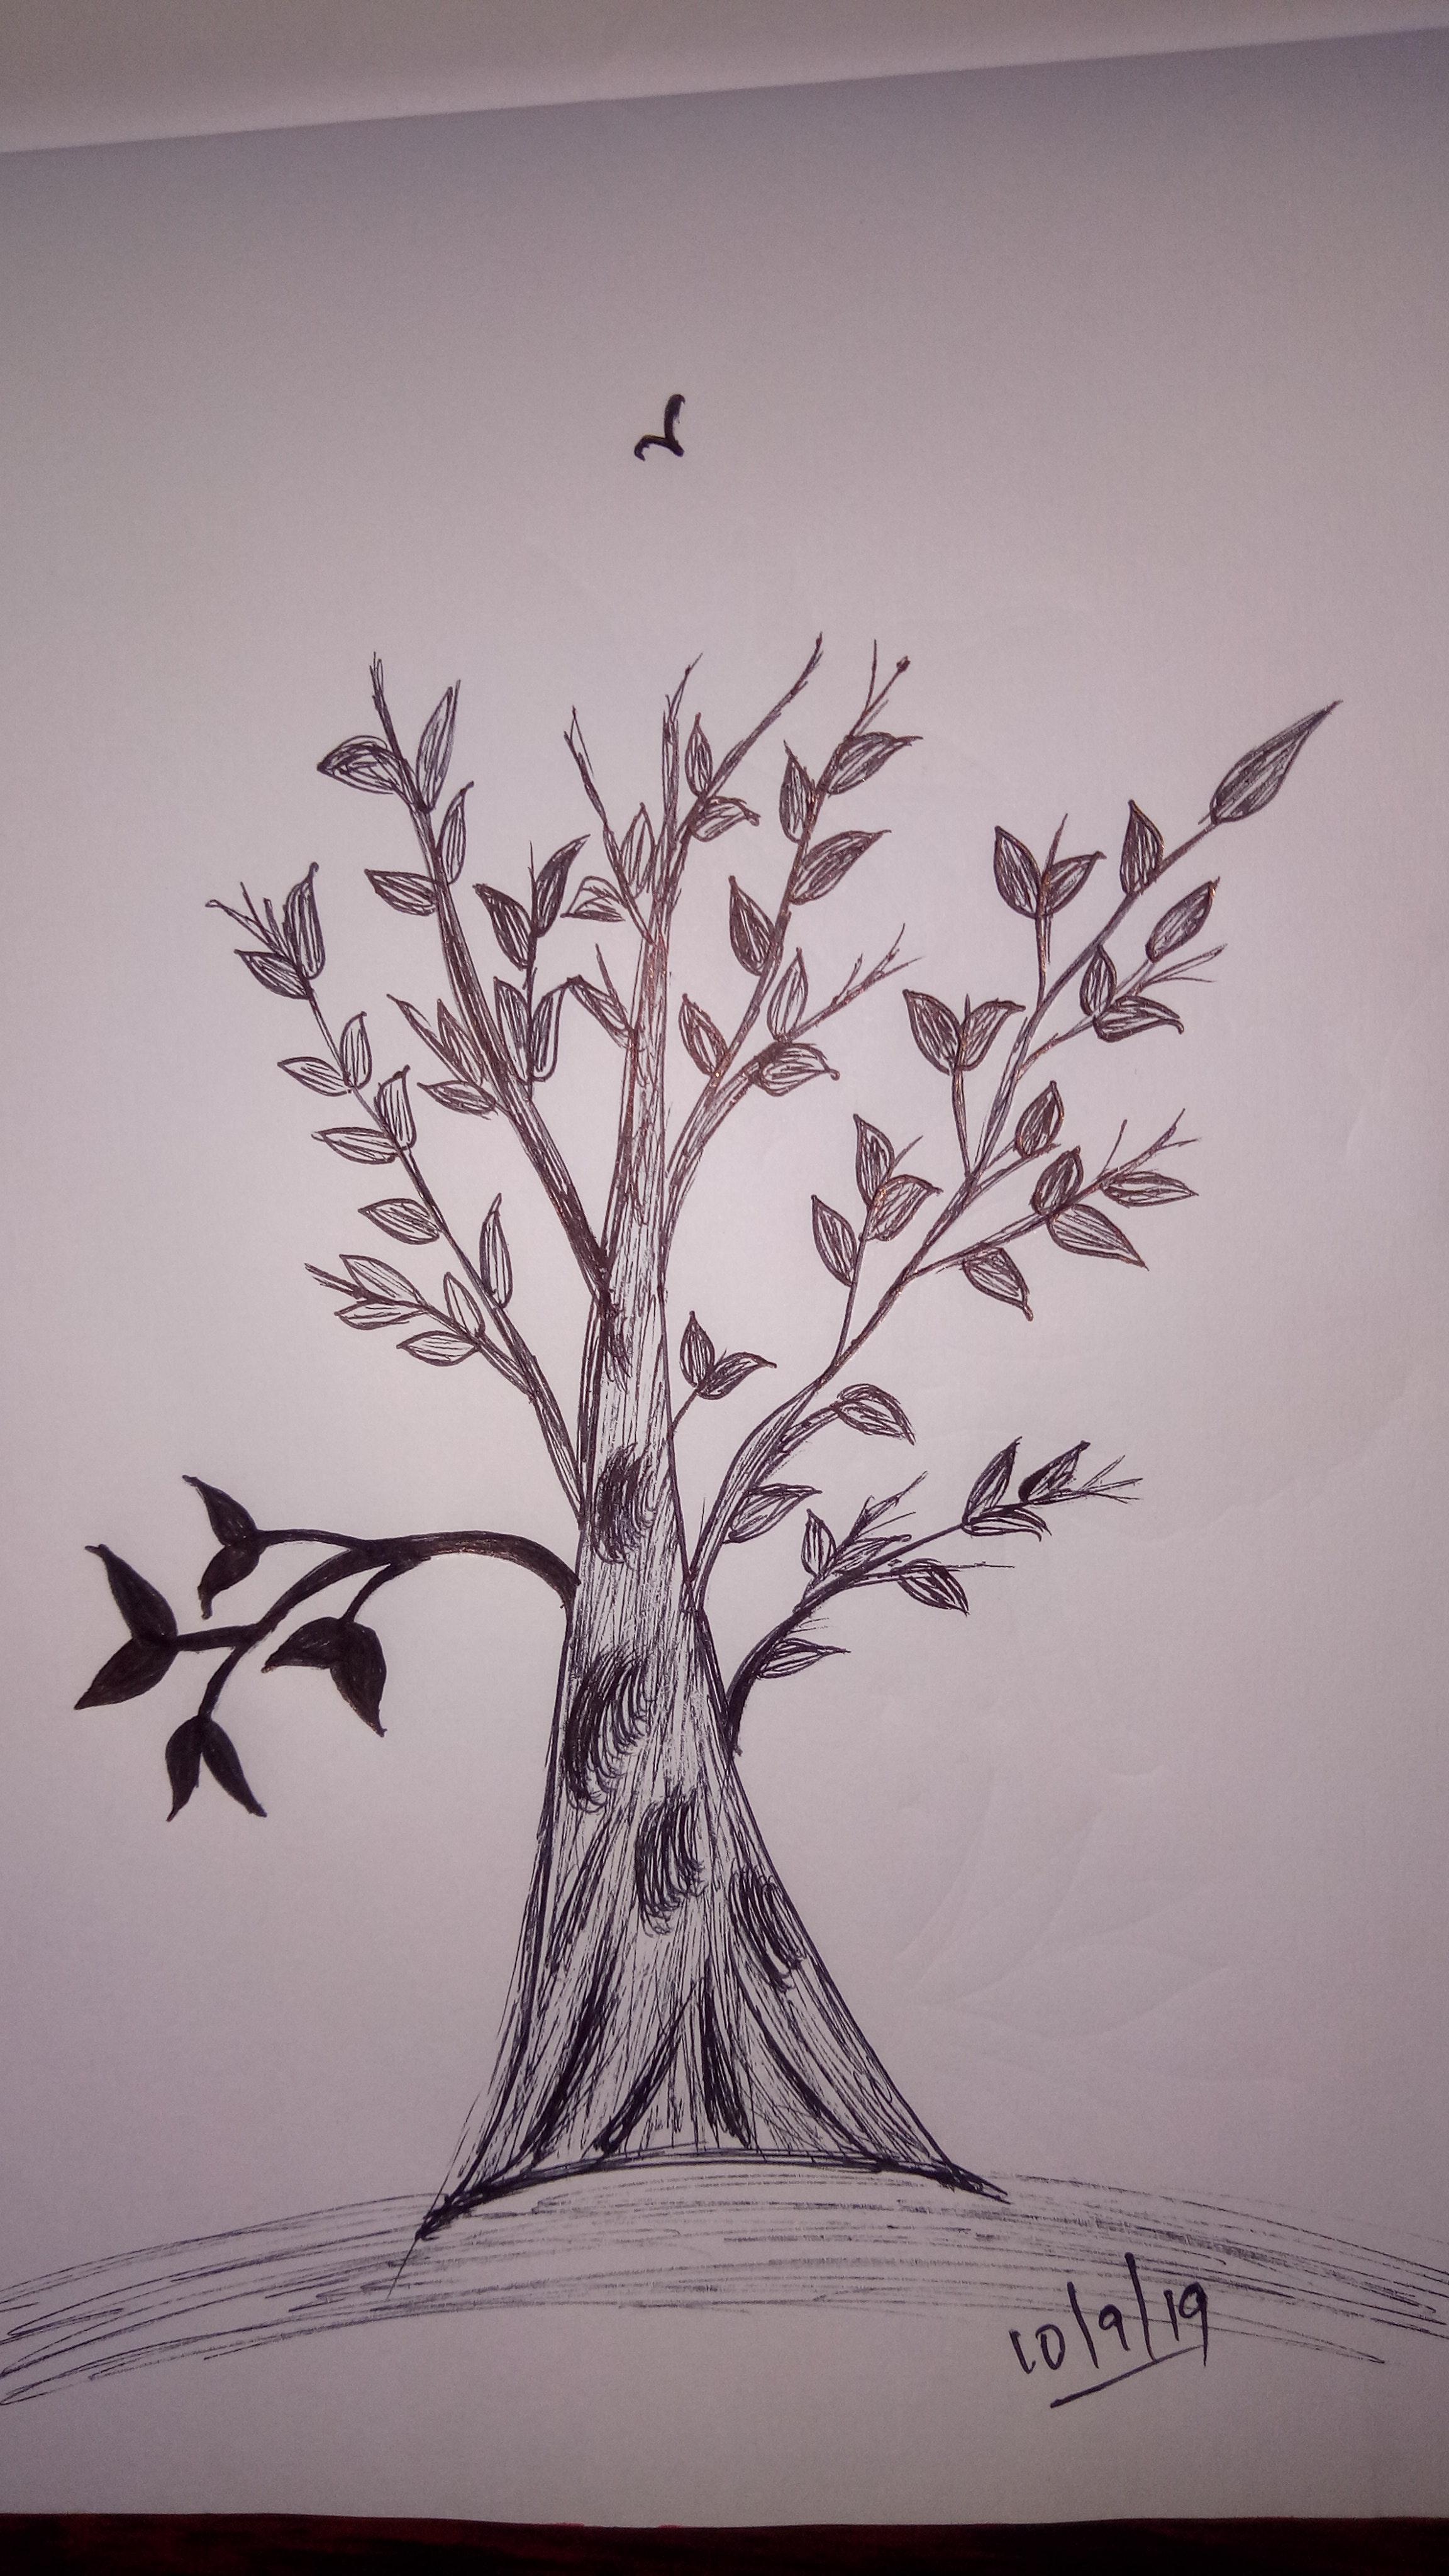 Foto Stok Gratis Tentang Sketsa Pohon